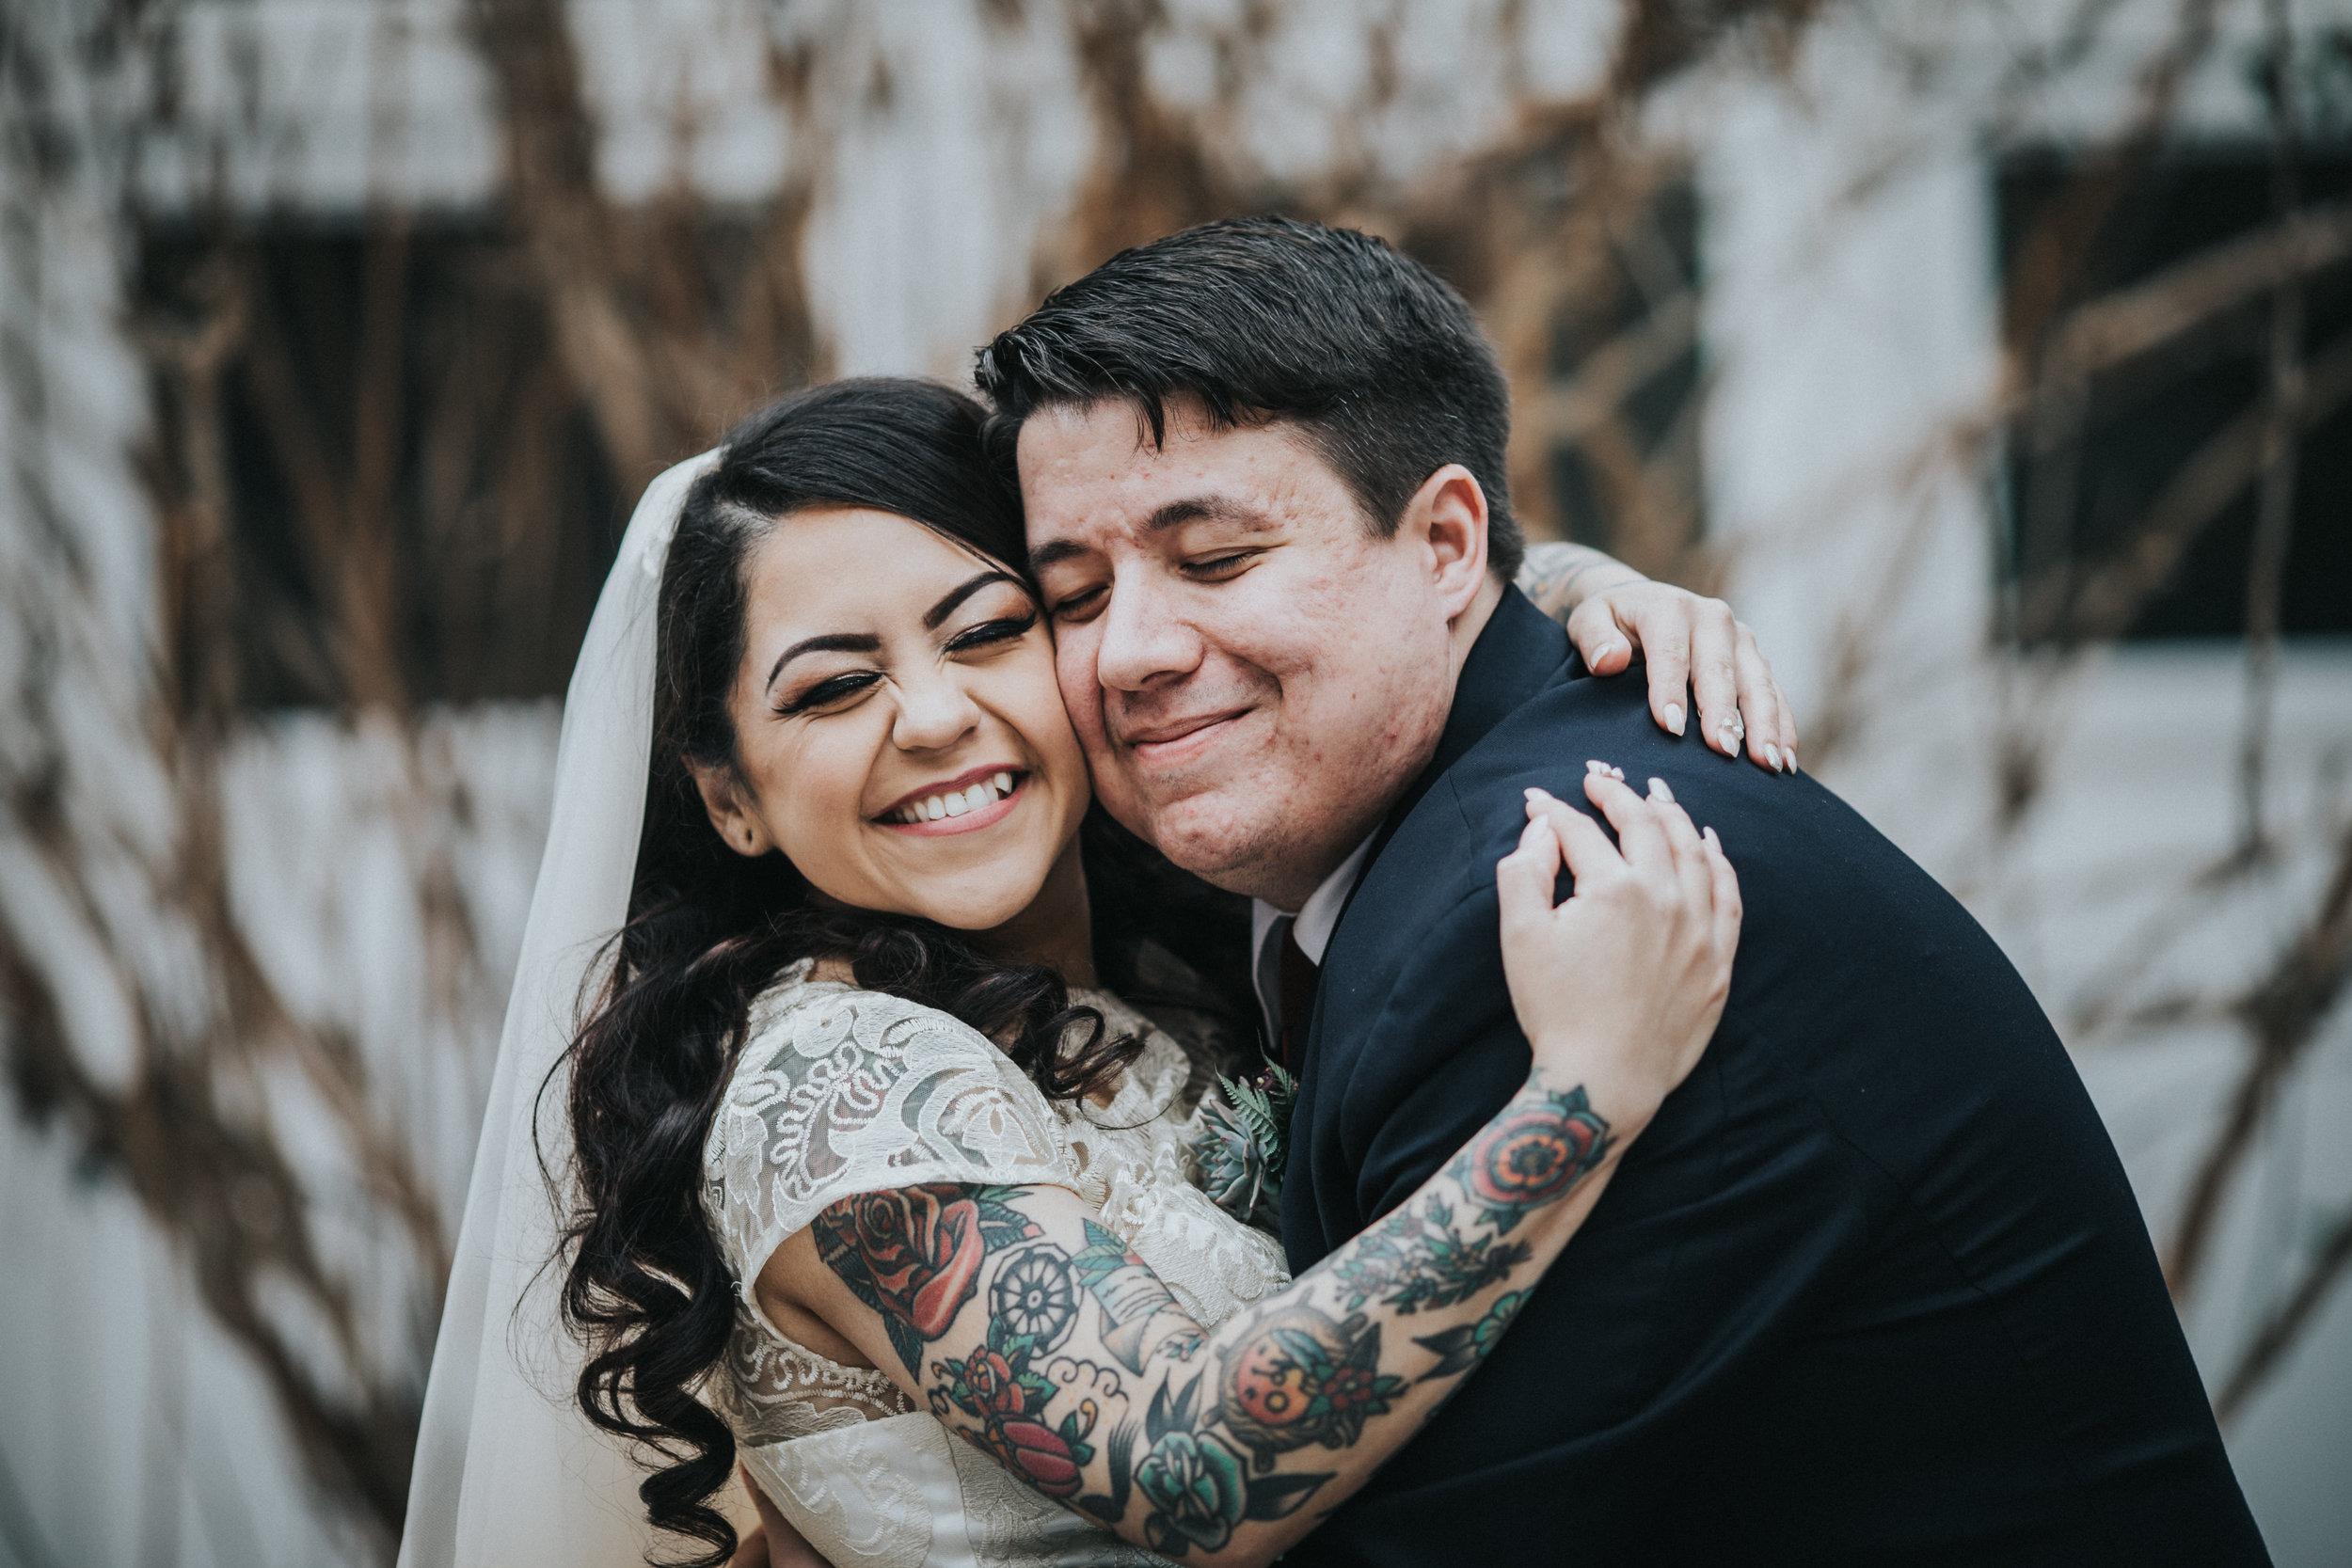 New-Jersey-Wedding-Photographer-ReceptionCenter-Valeria&Mike-First-Look-Bride&Groom (45 of 69).jpg